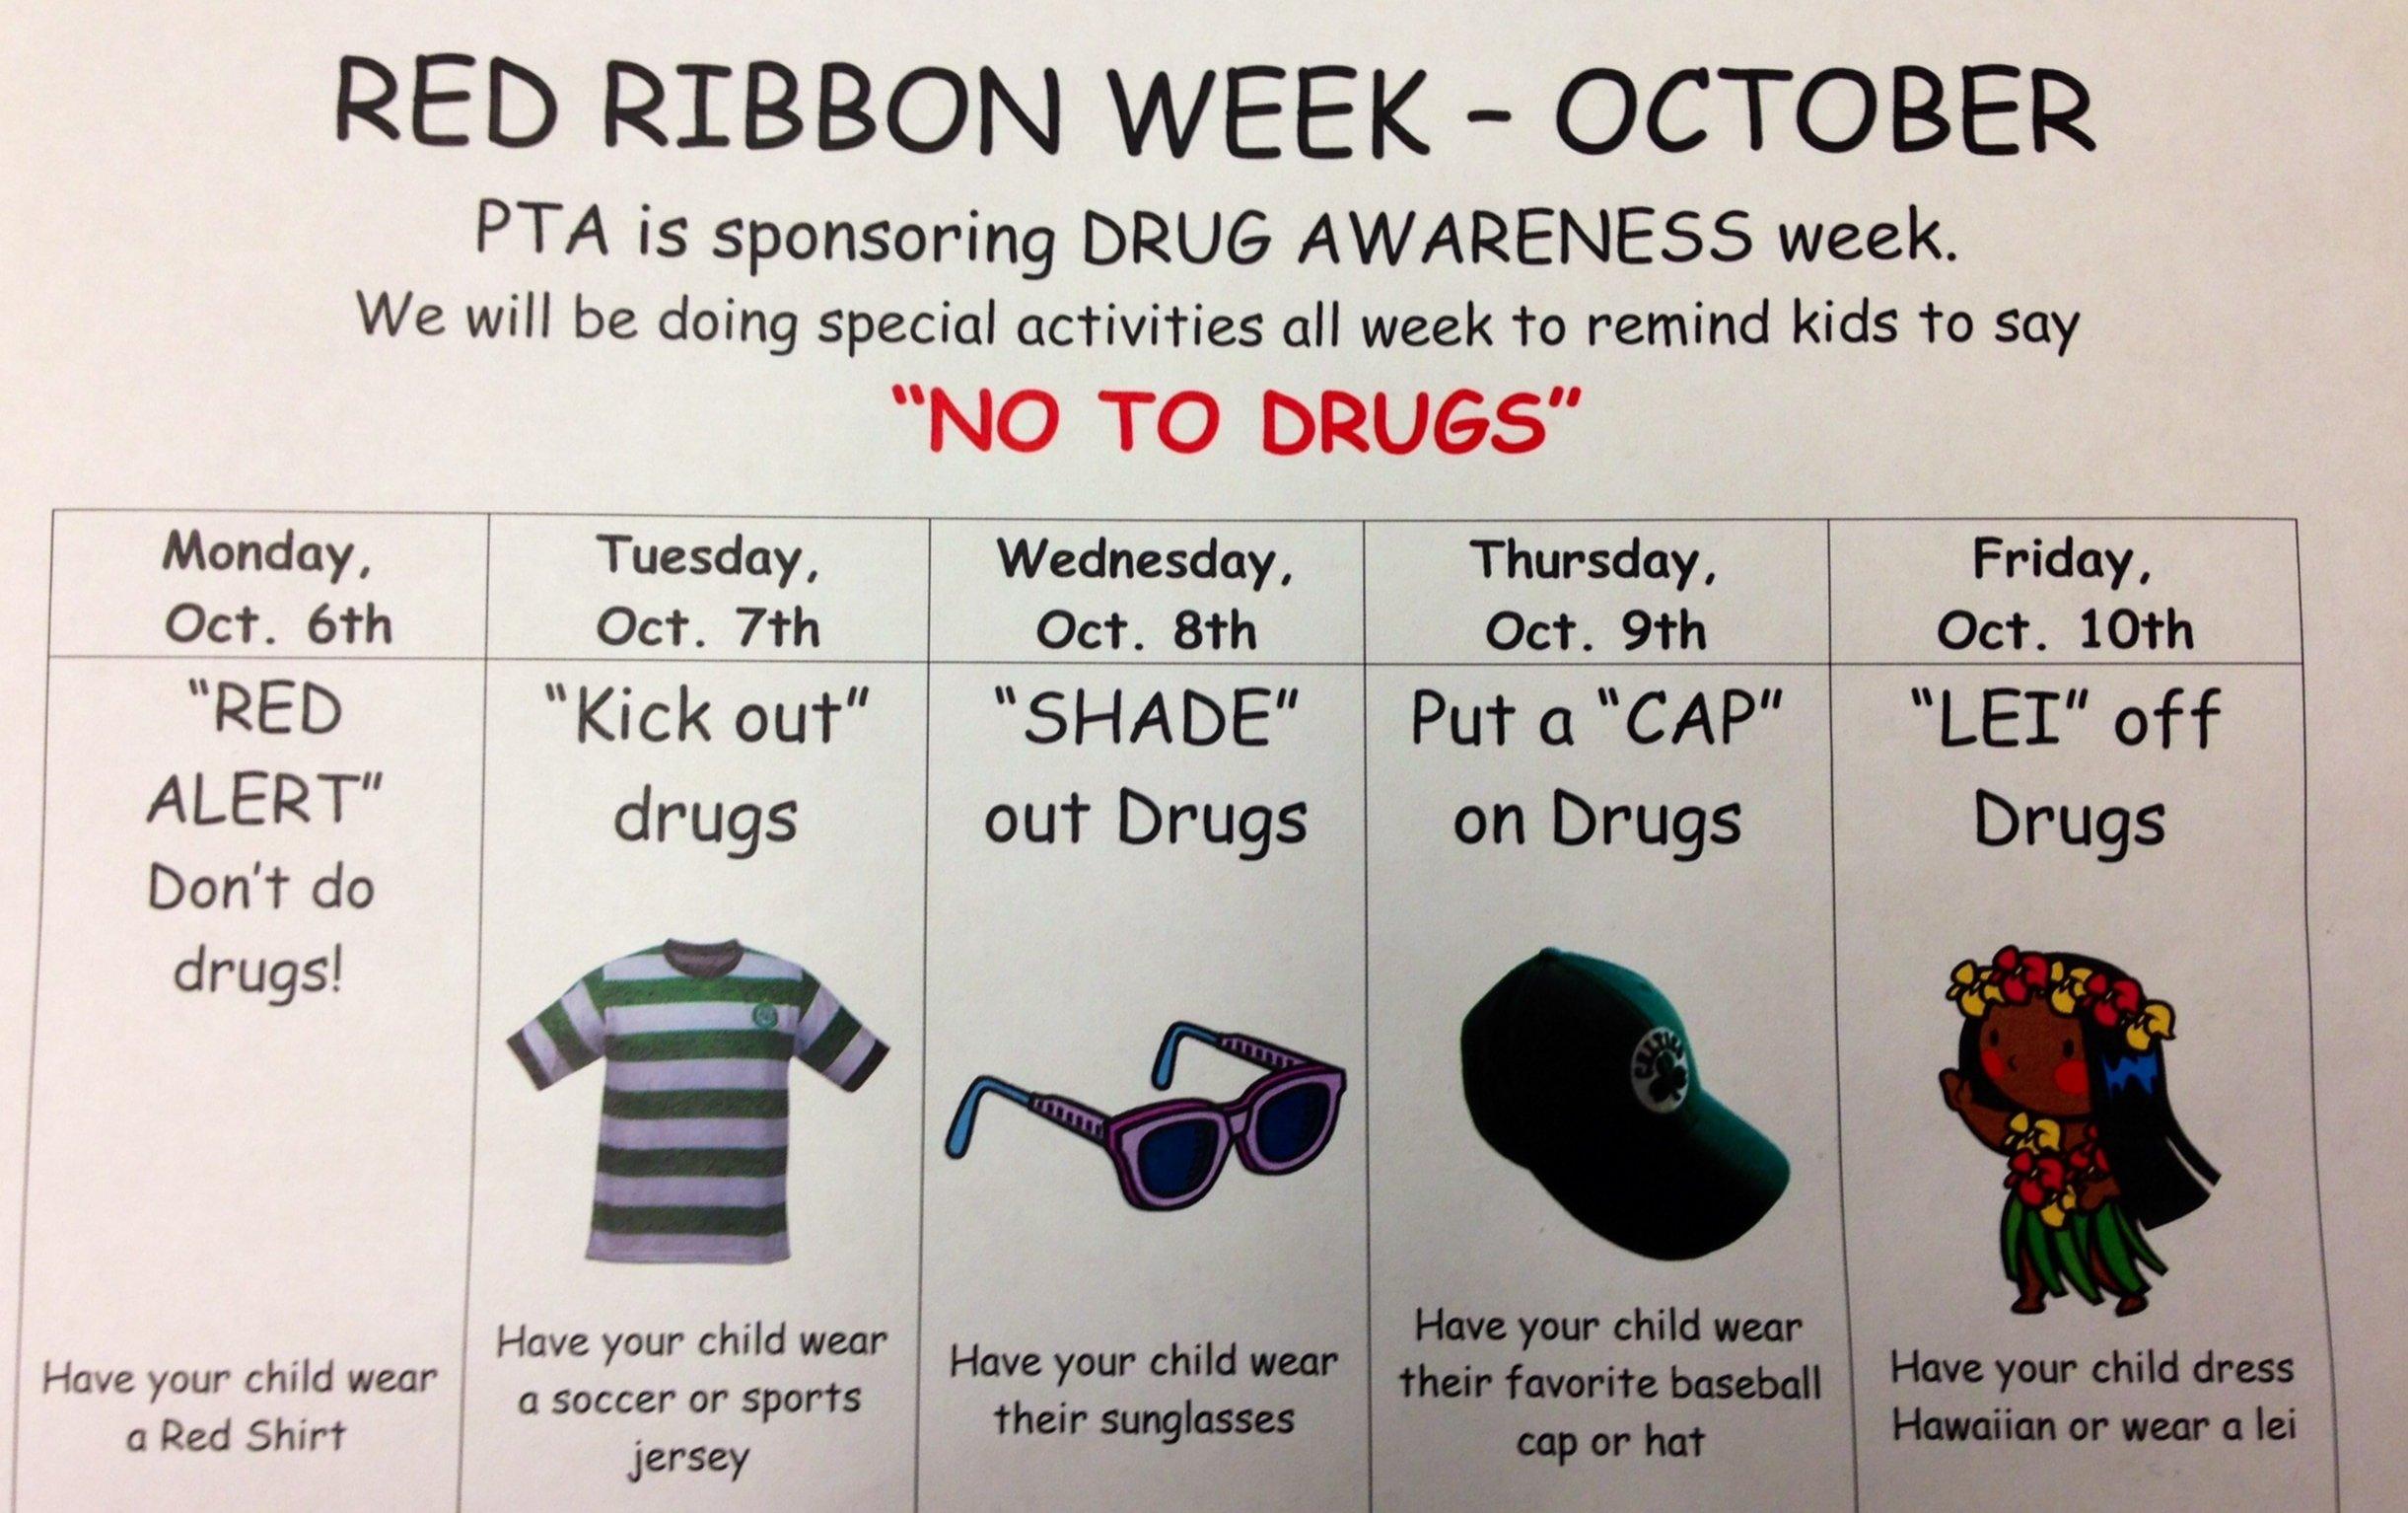 10 Lovable Red Ribbon Week Ideas For Elementary School red ribbon week 21st century educator 1 2020